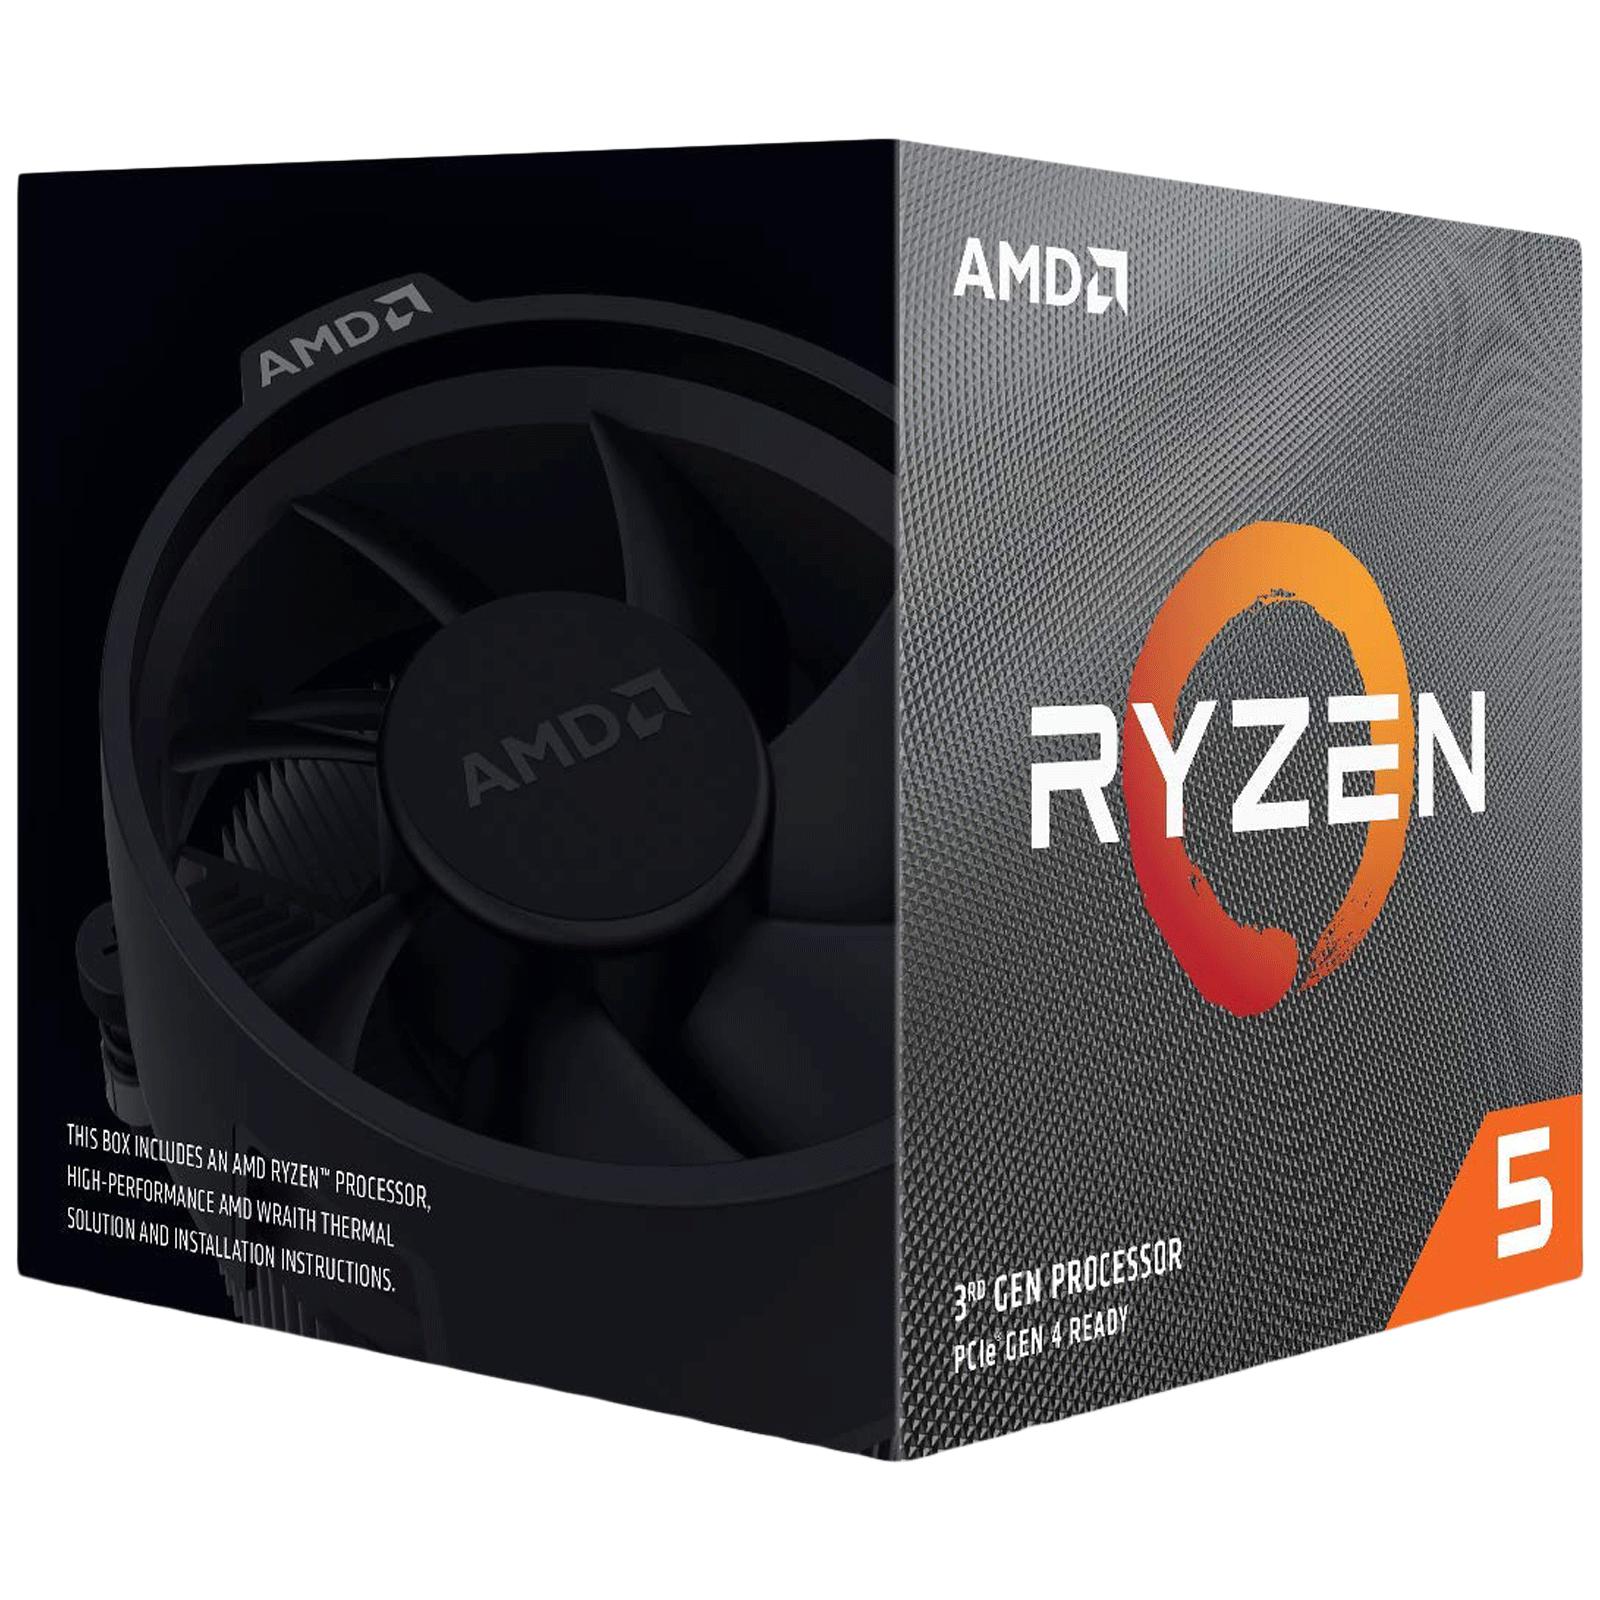 AMD Ryzen 5 Desktop Processor (6 Cores, 3.6 GHz, Wraith Stealth, 3500, Silver)_1